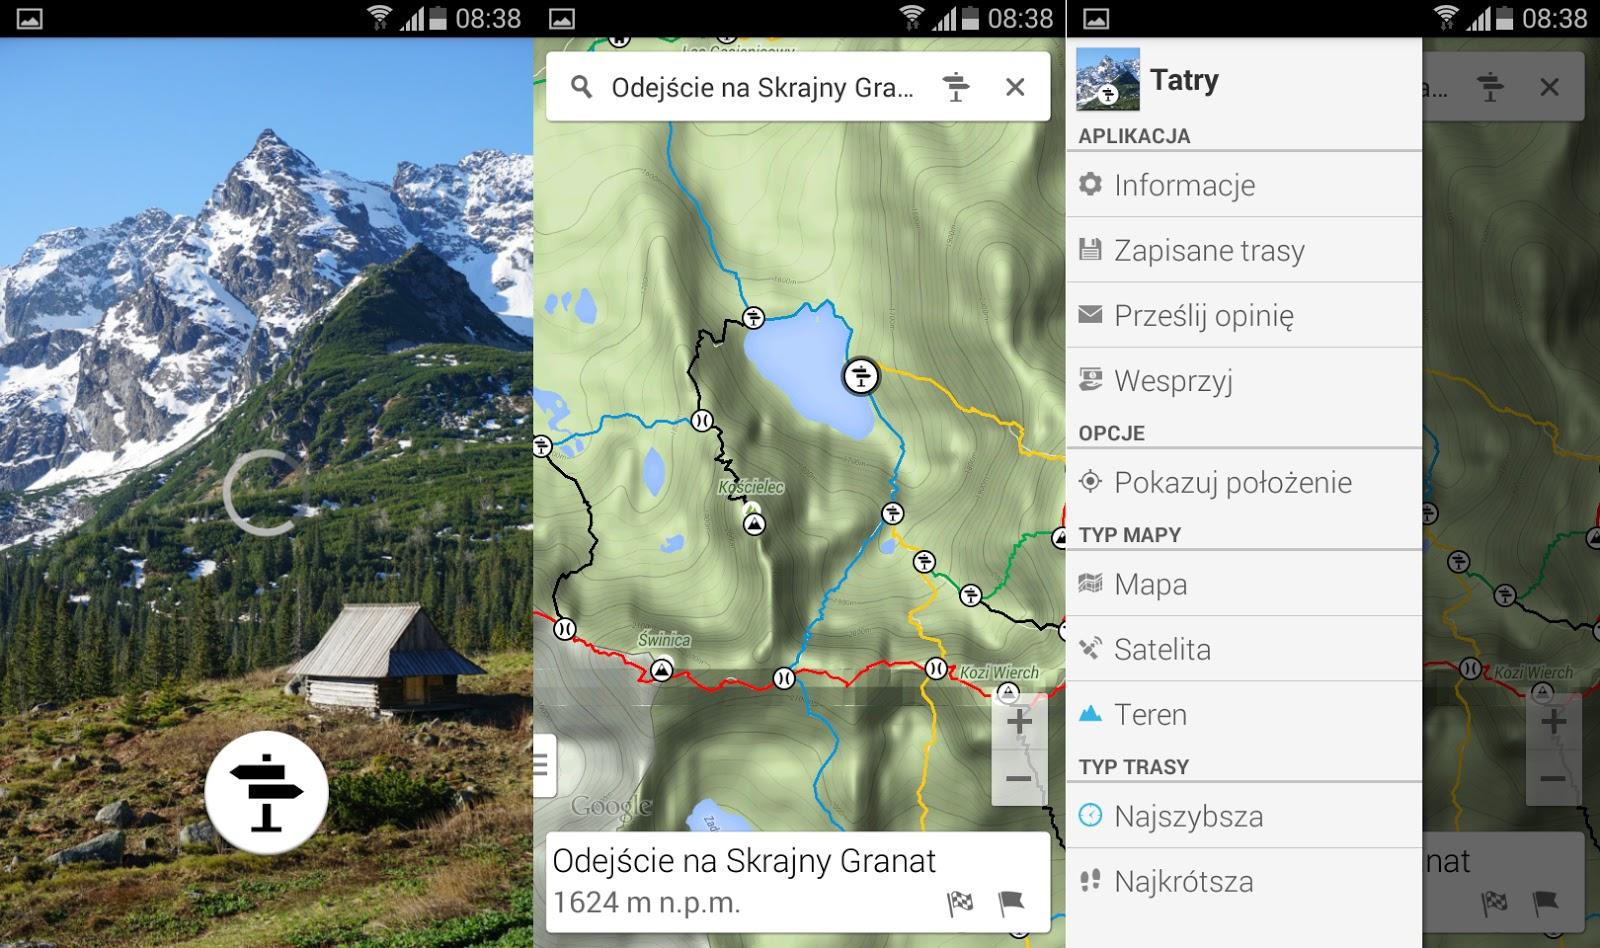 Szlaki Tatry Pieniny Babia Góra